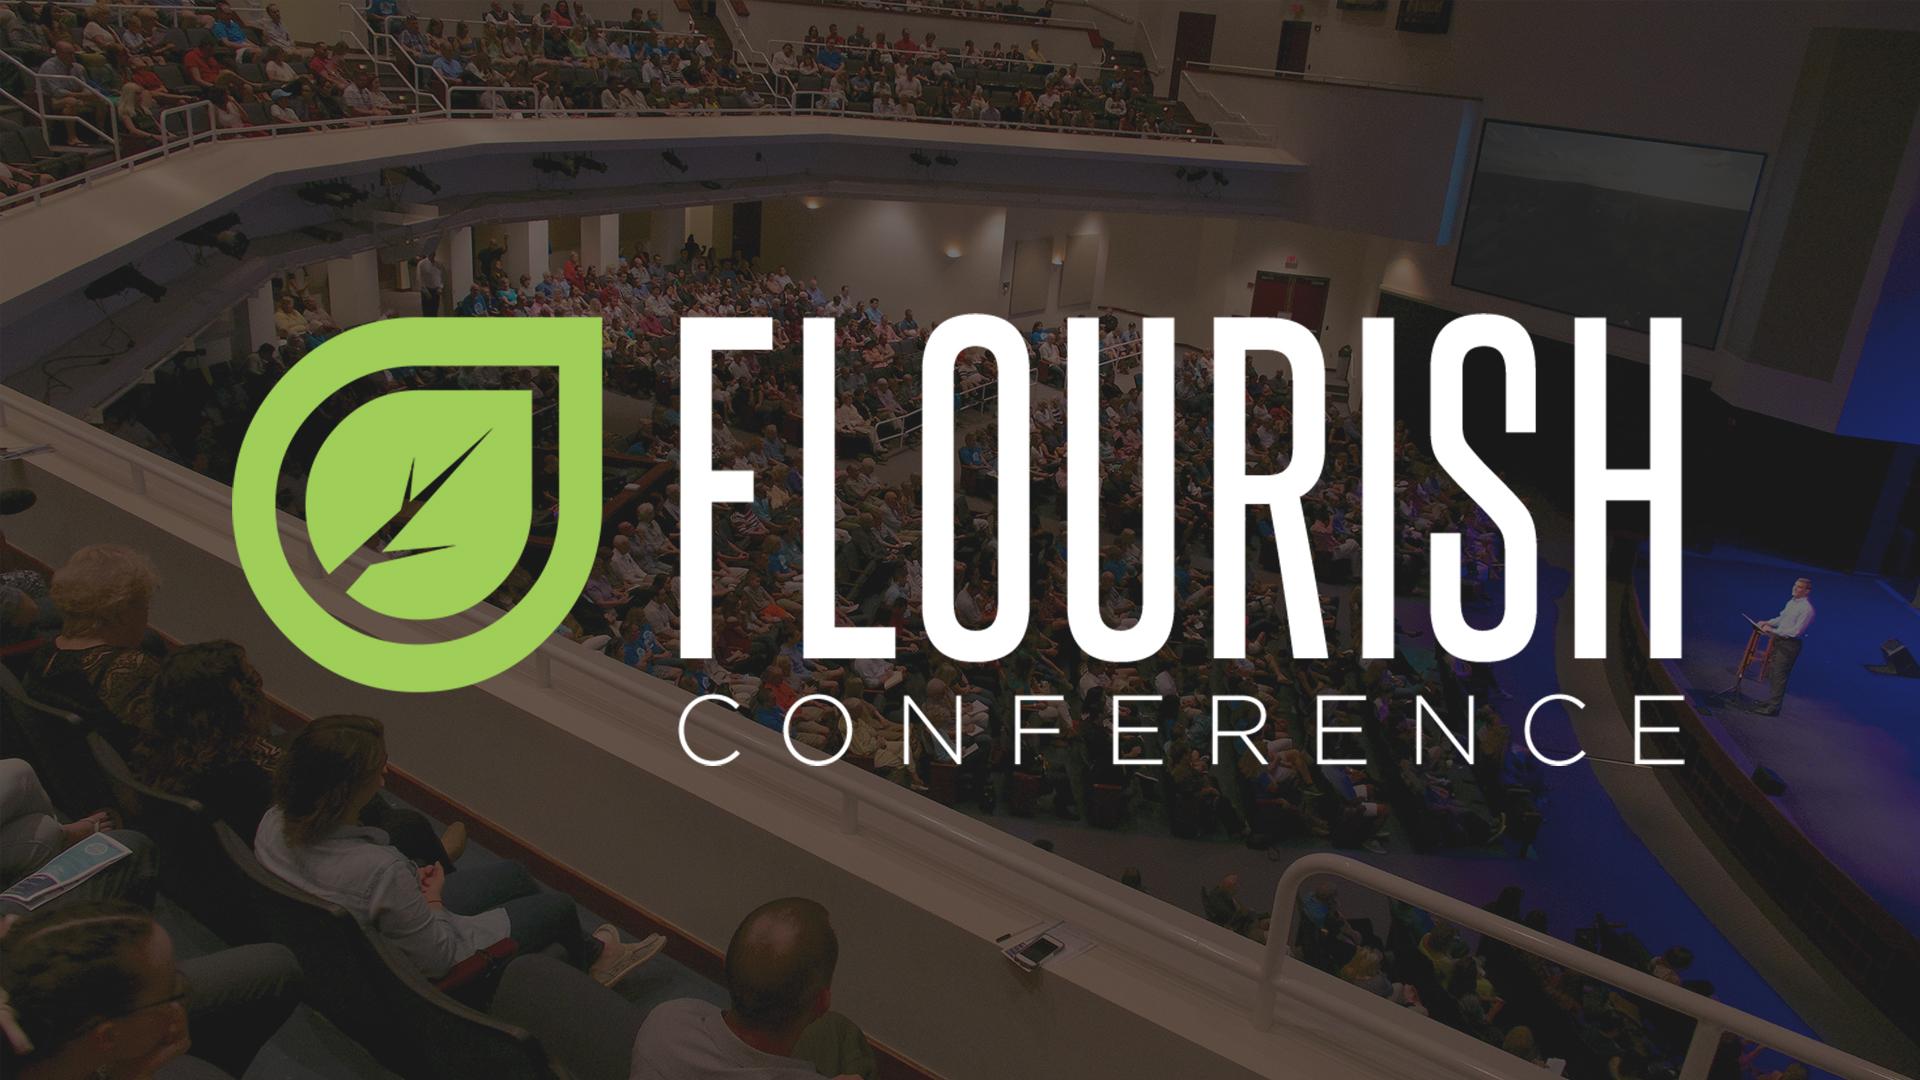 Flourish Conference 1920x1080-2.jpg